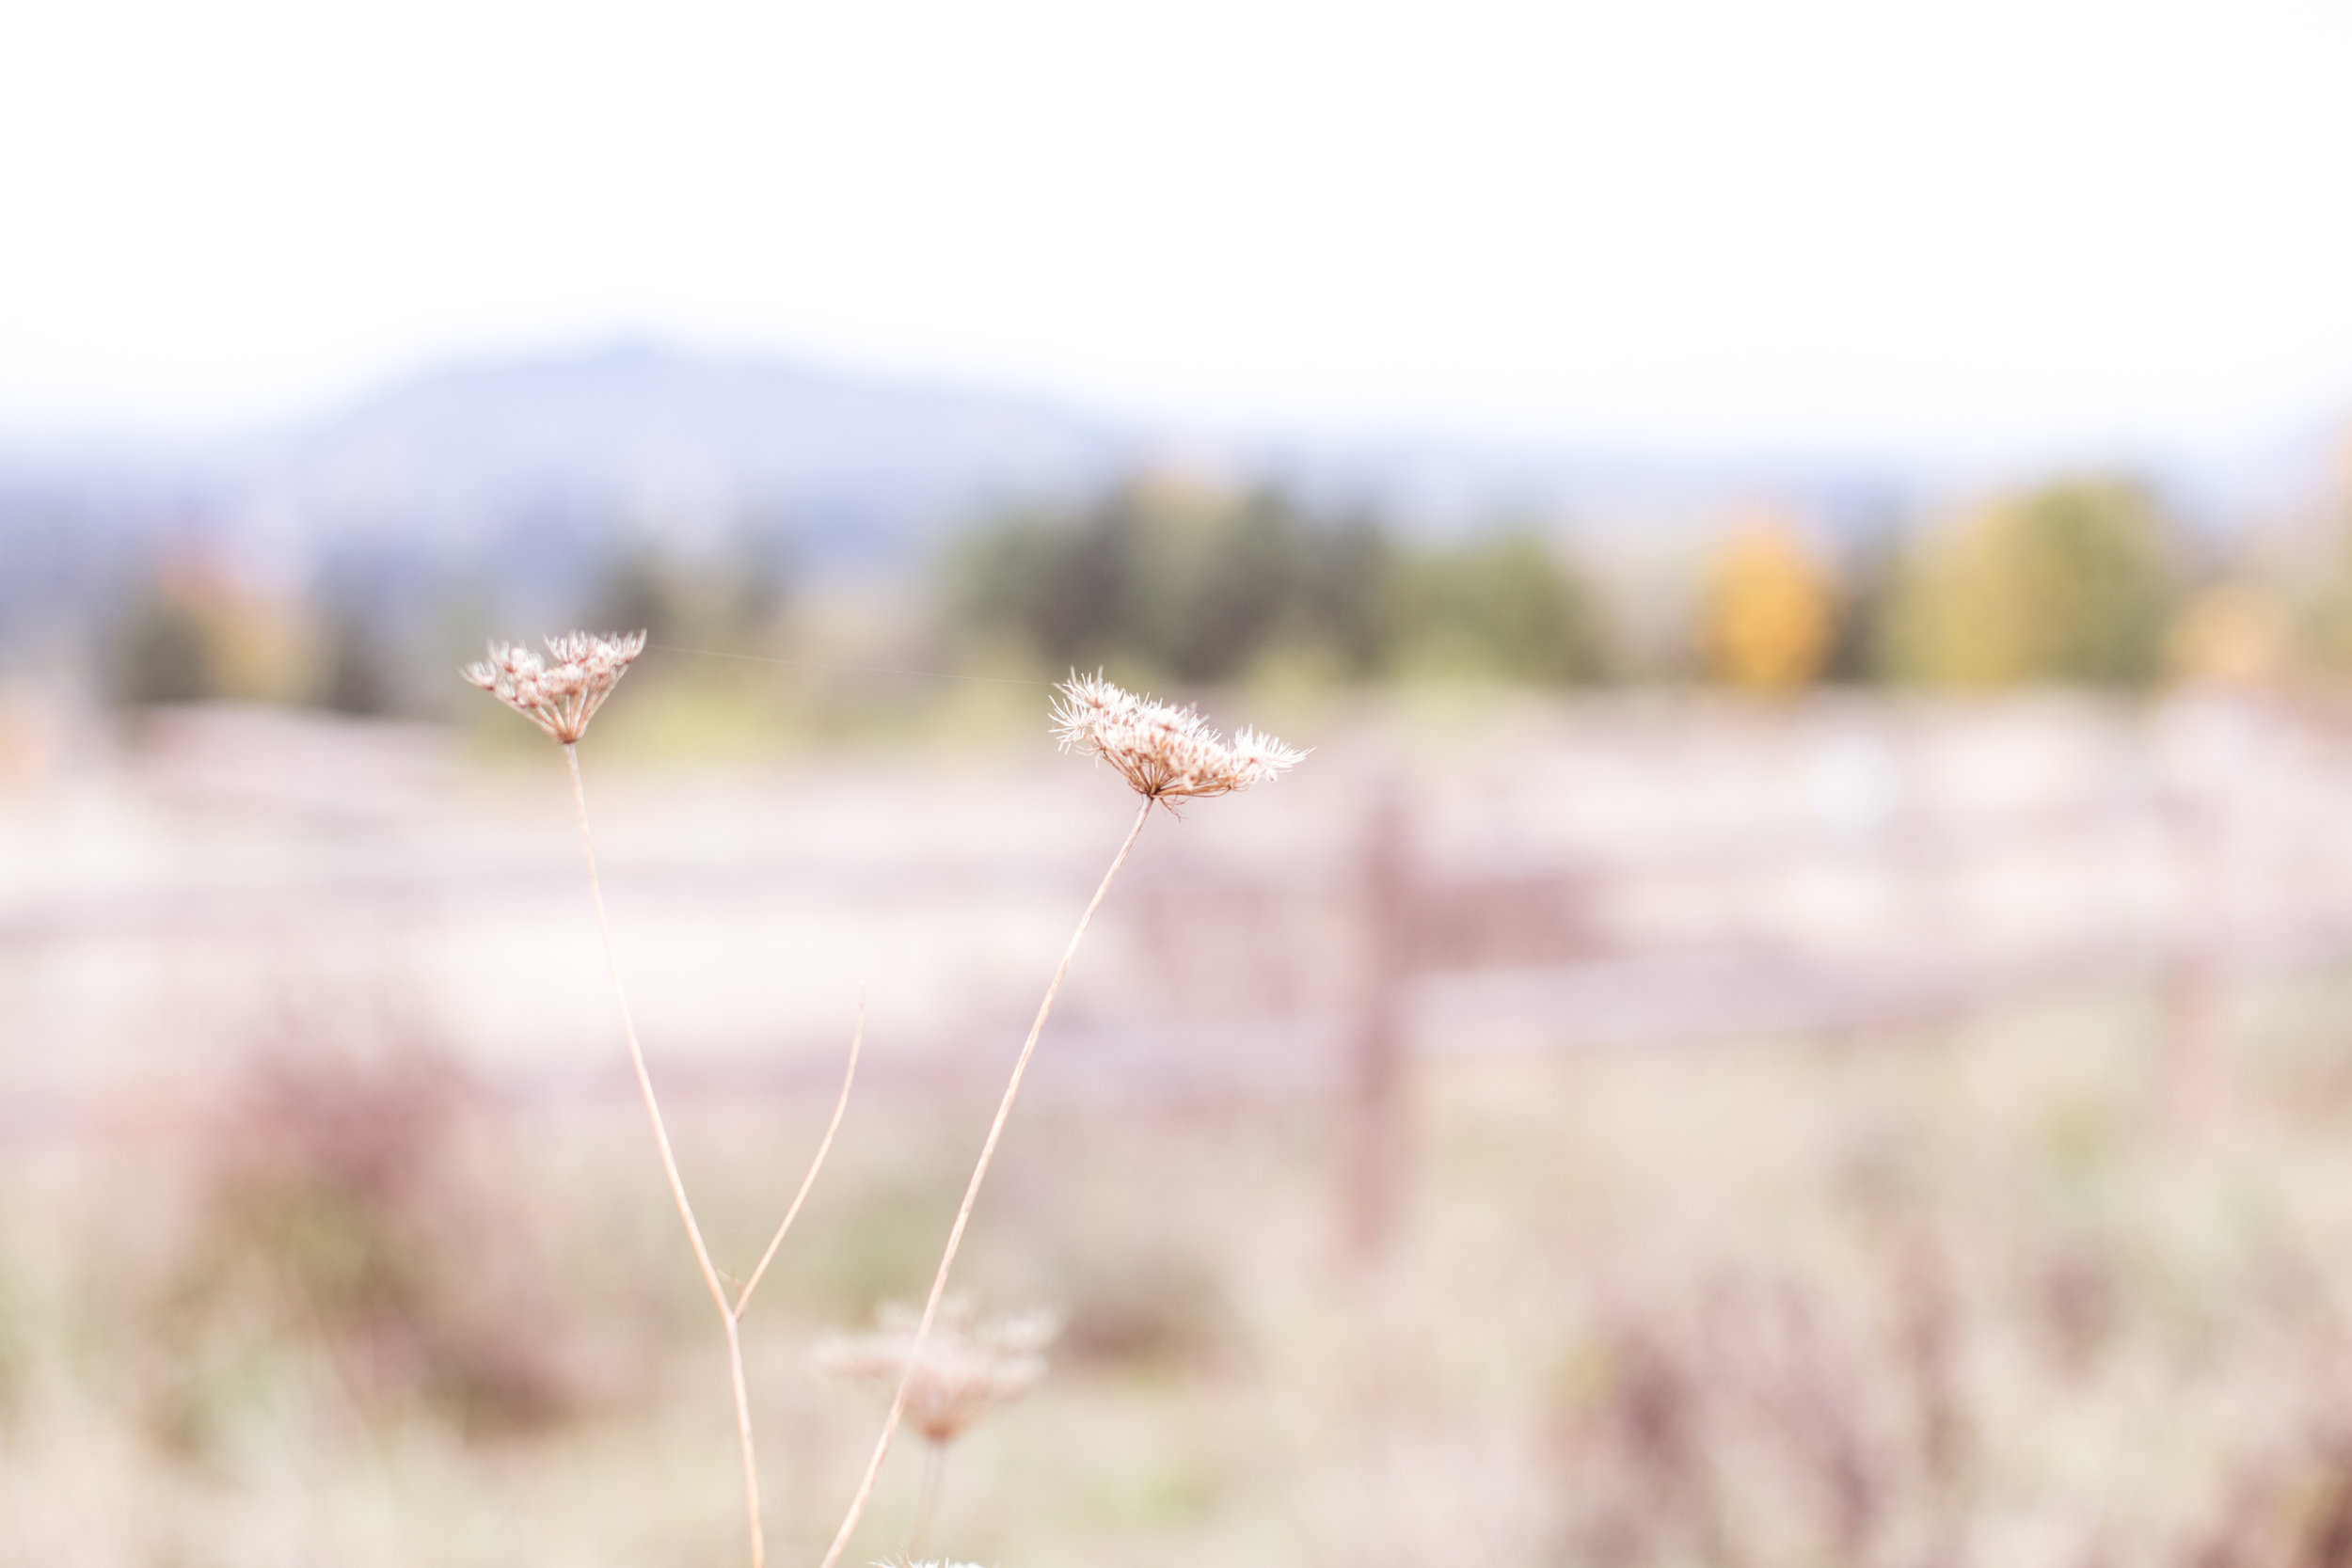 natalie brenner photography